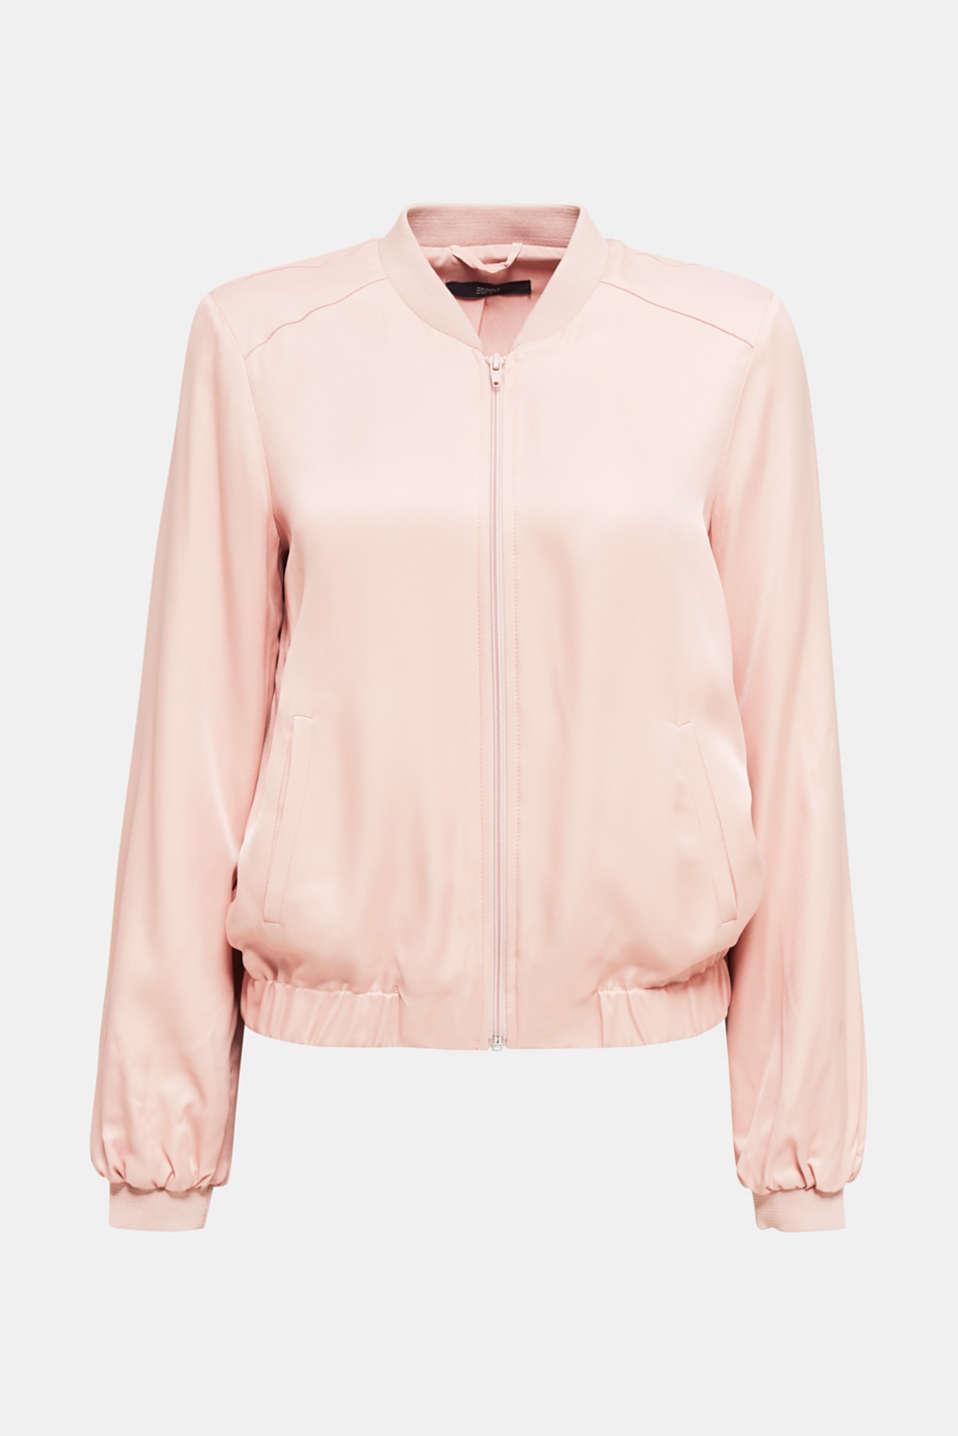 Satin bomber jacket, NUDE, detail image number 6